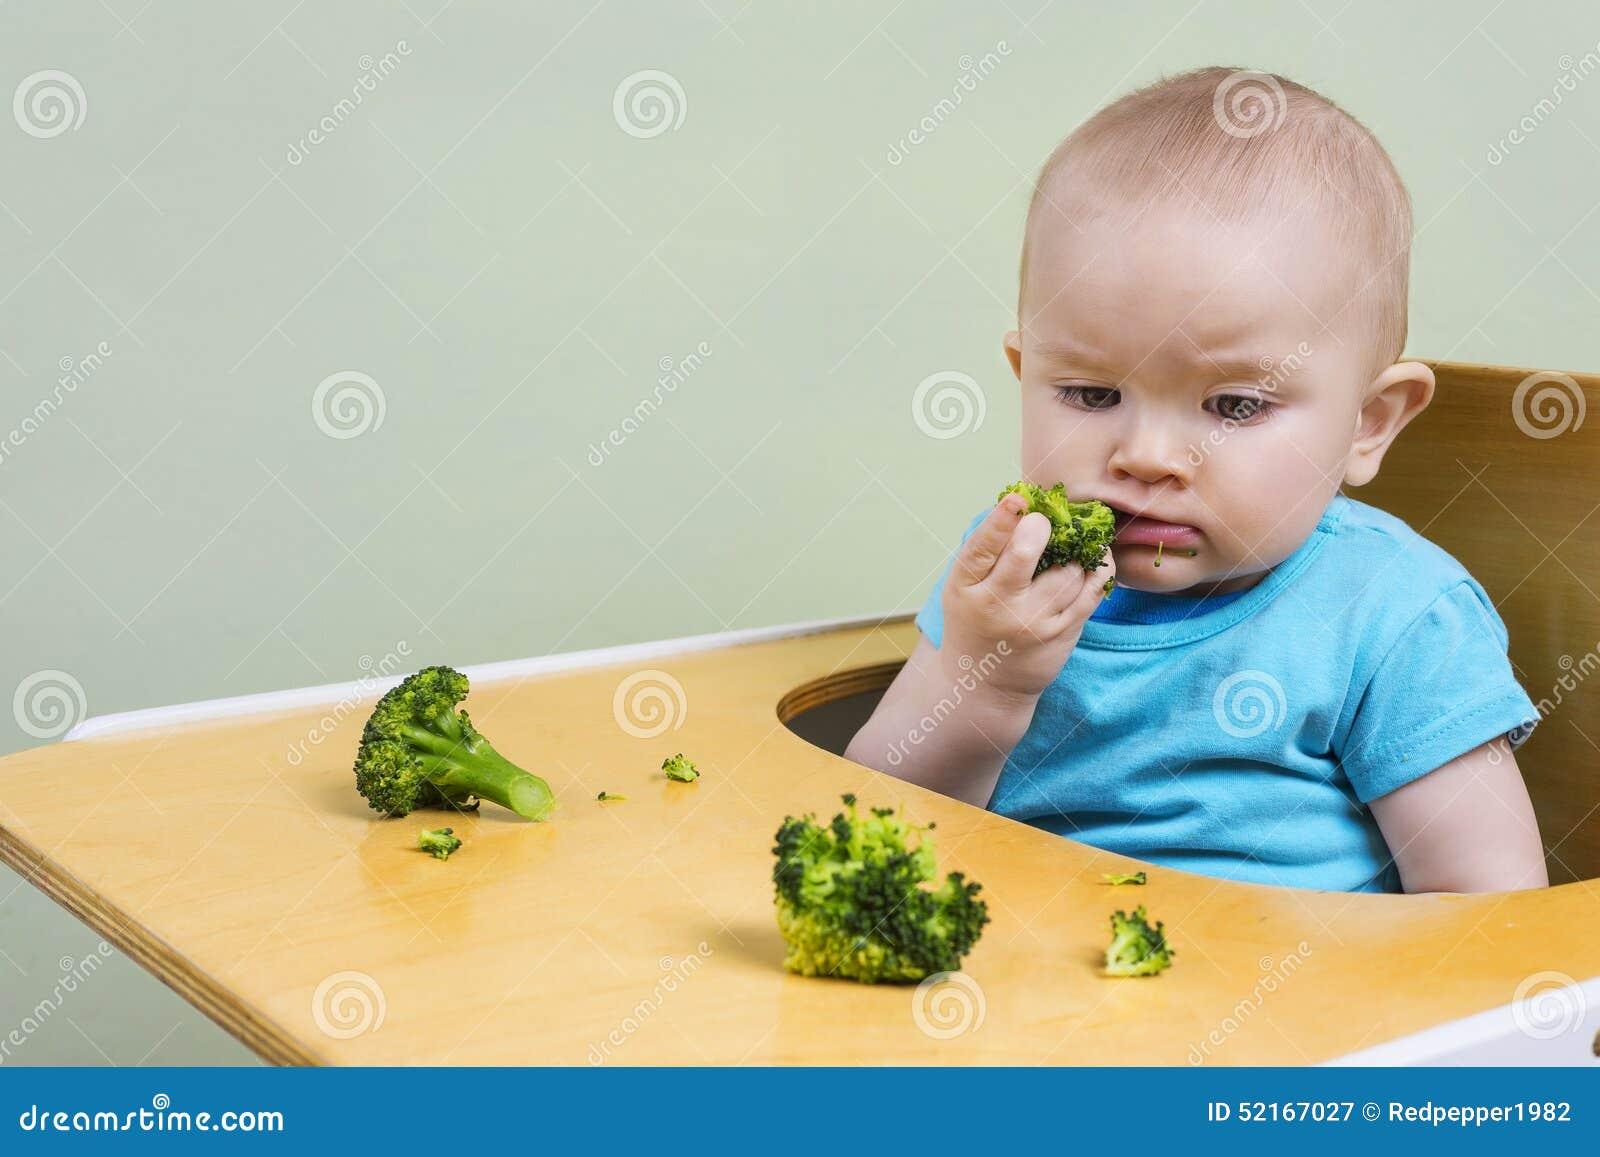 Leuke baby proevende broccoli